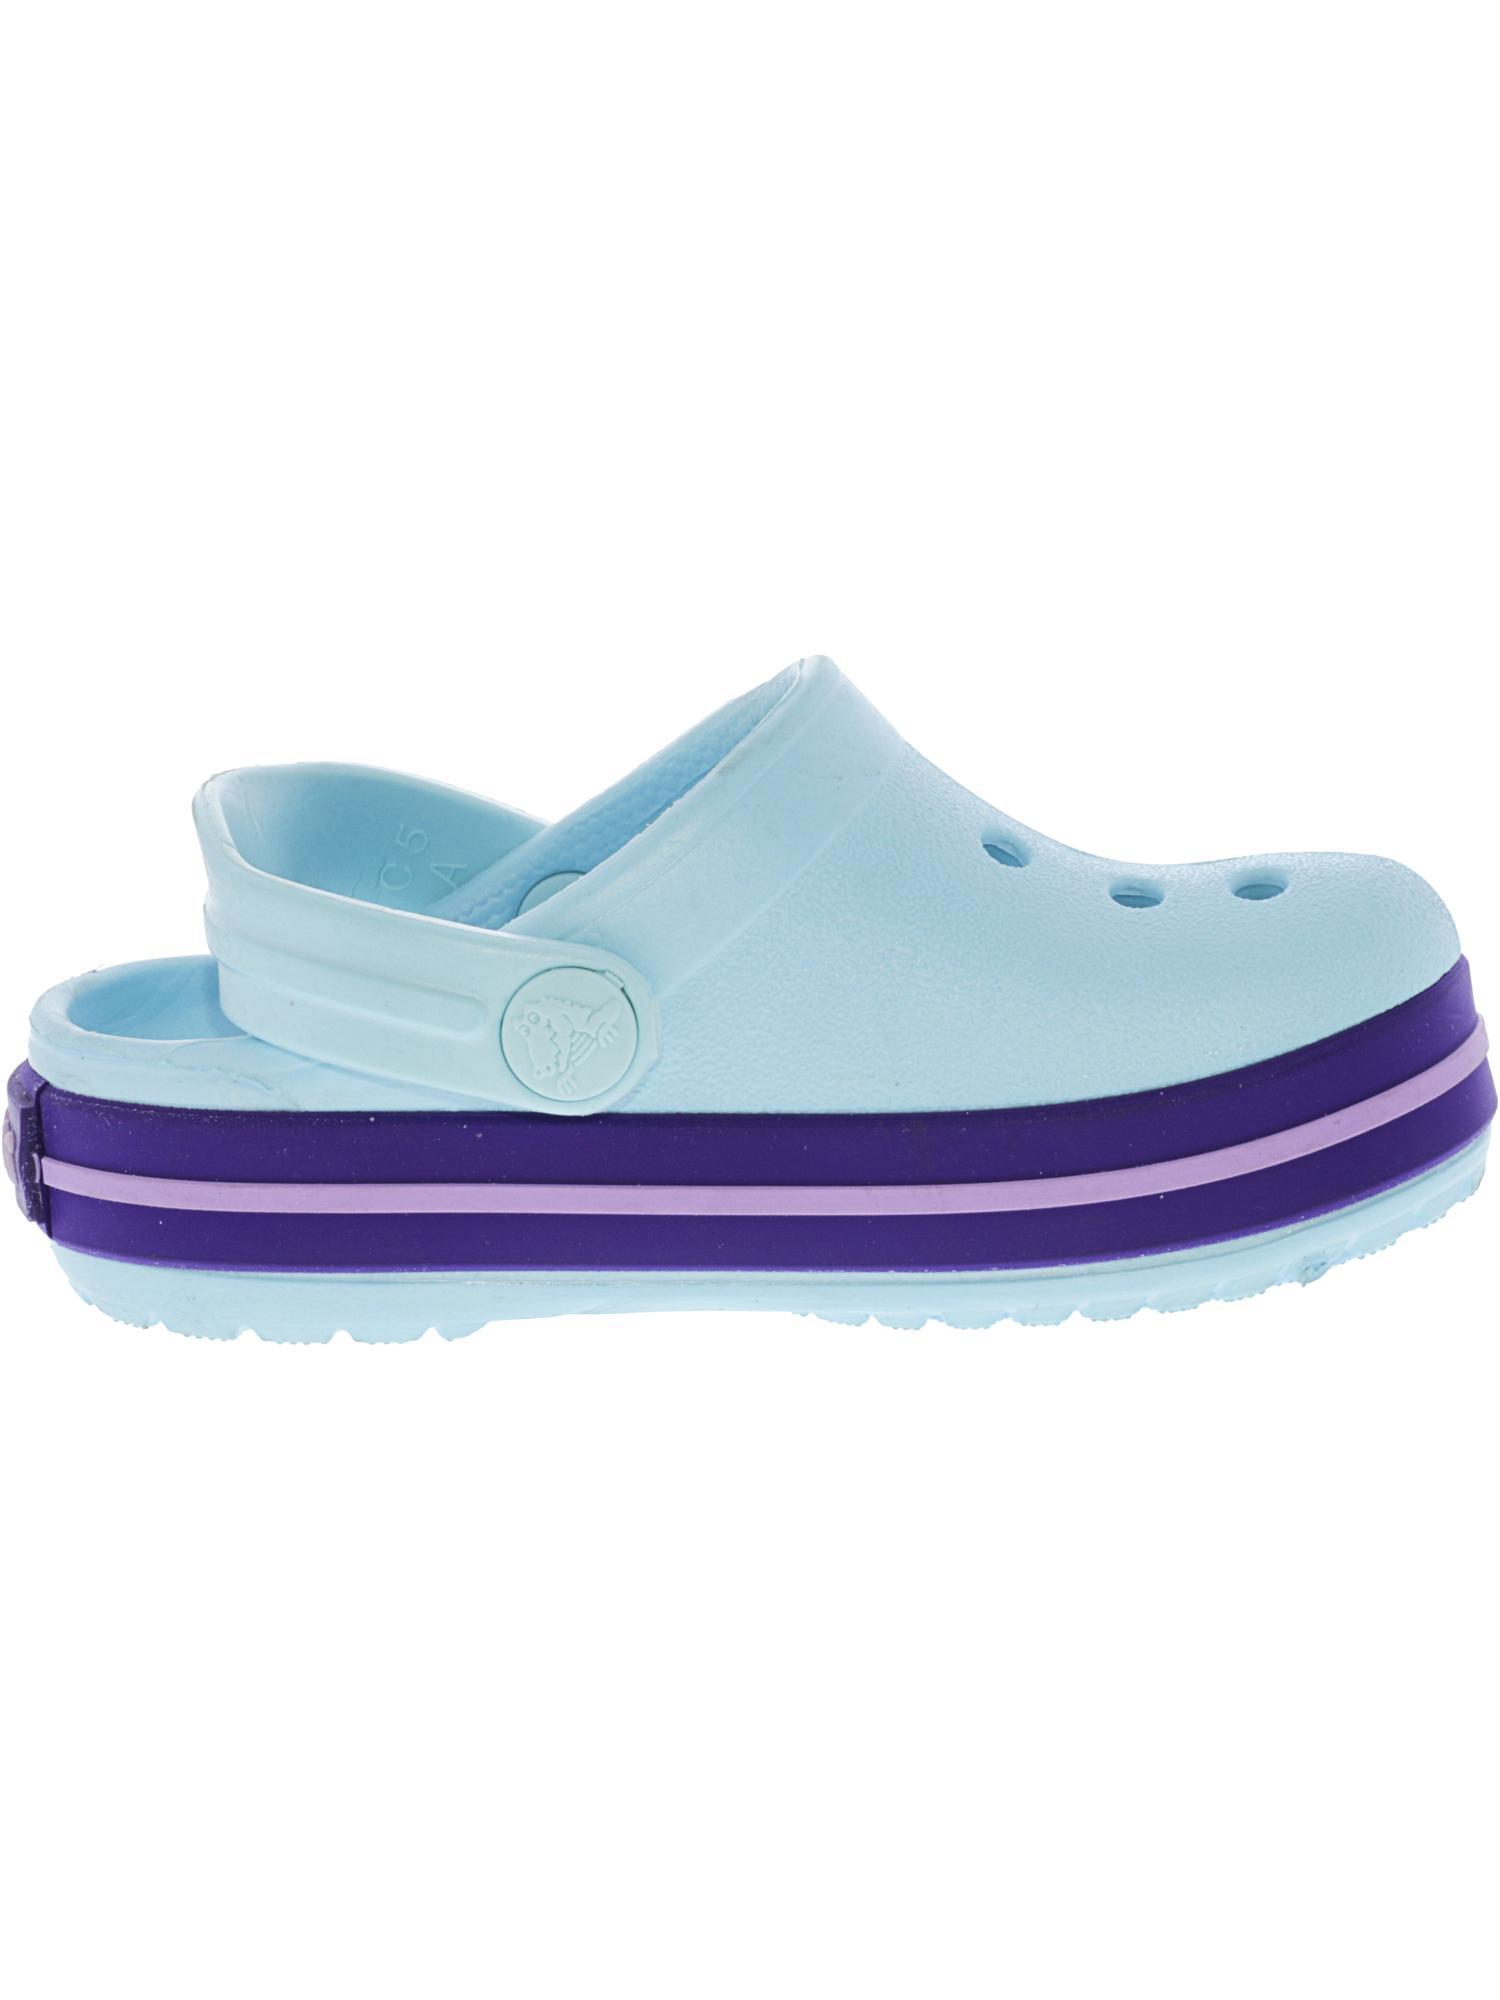 Crocs Kids Crocband Clog Clogs